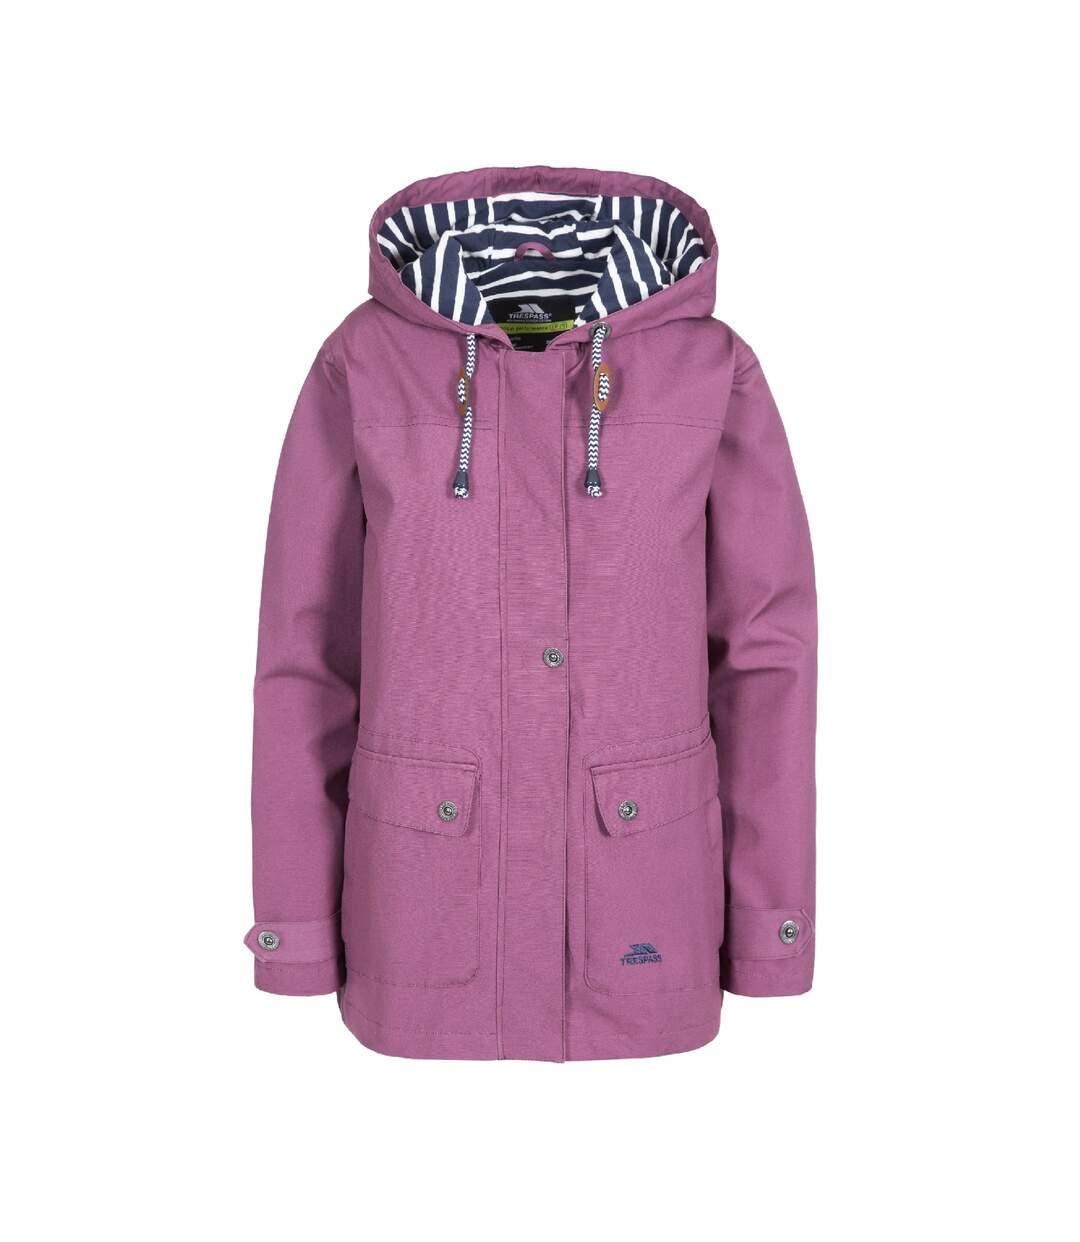 Trespass Womens/Ladies Seawater Waterproof Jacket (Mauve) - UTTP3314